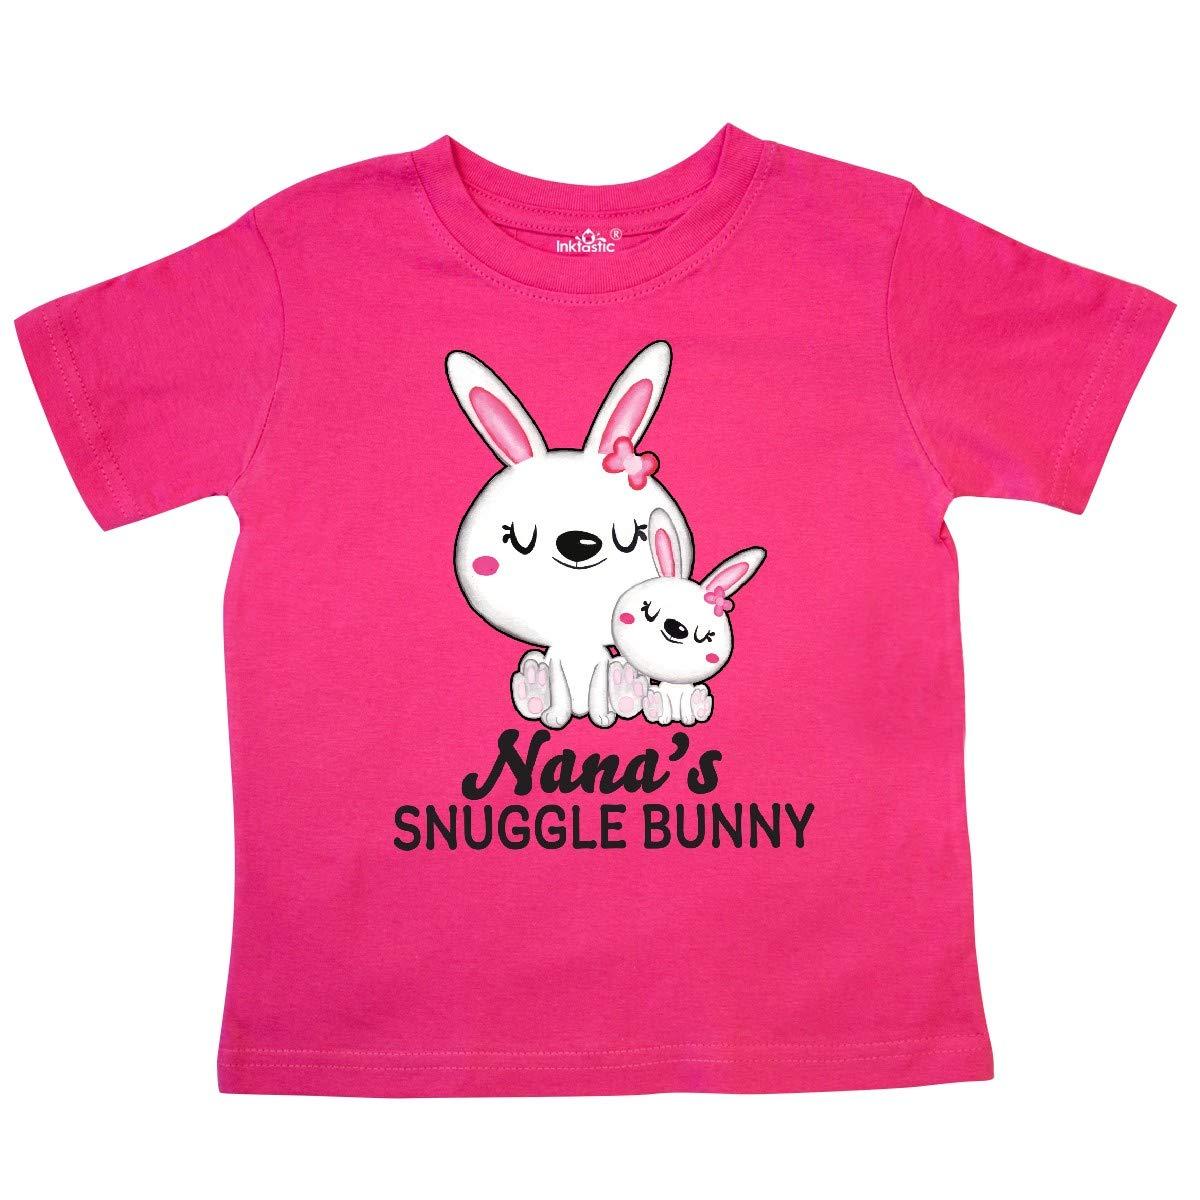 inktastic Nanas Snuggle Bunny Easter Toddler T-Shirt